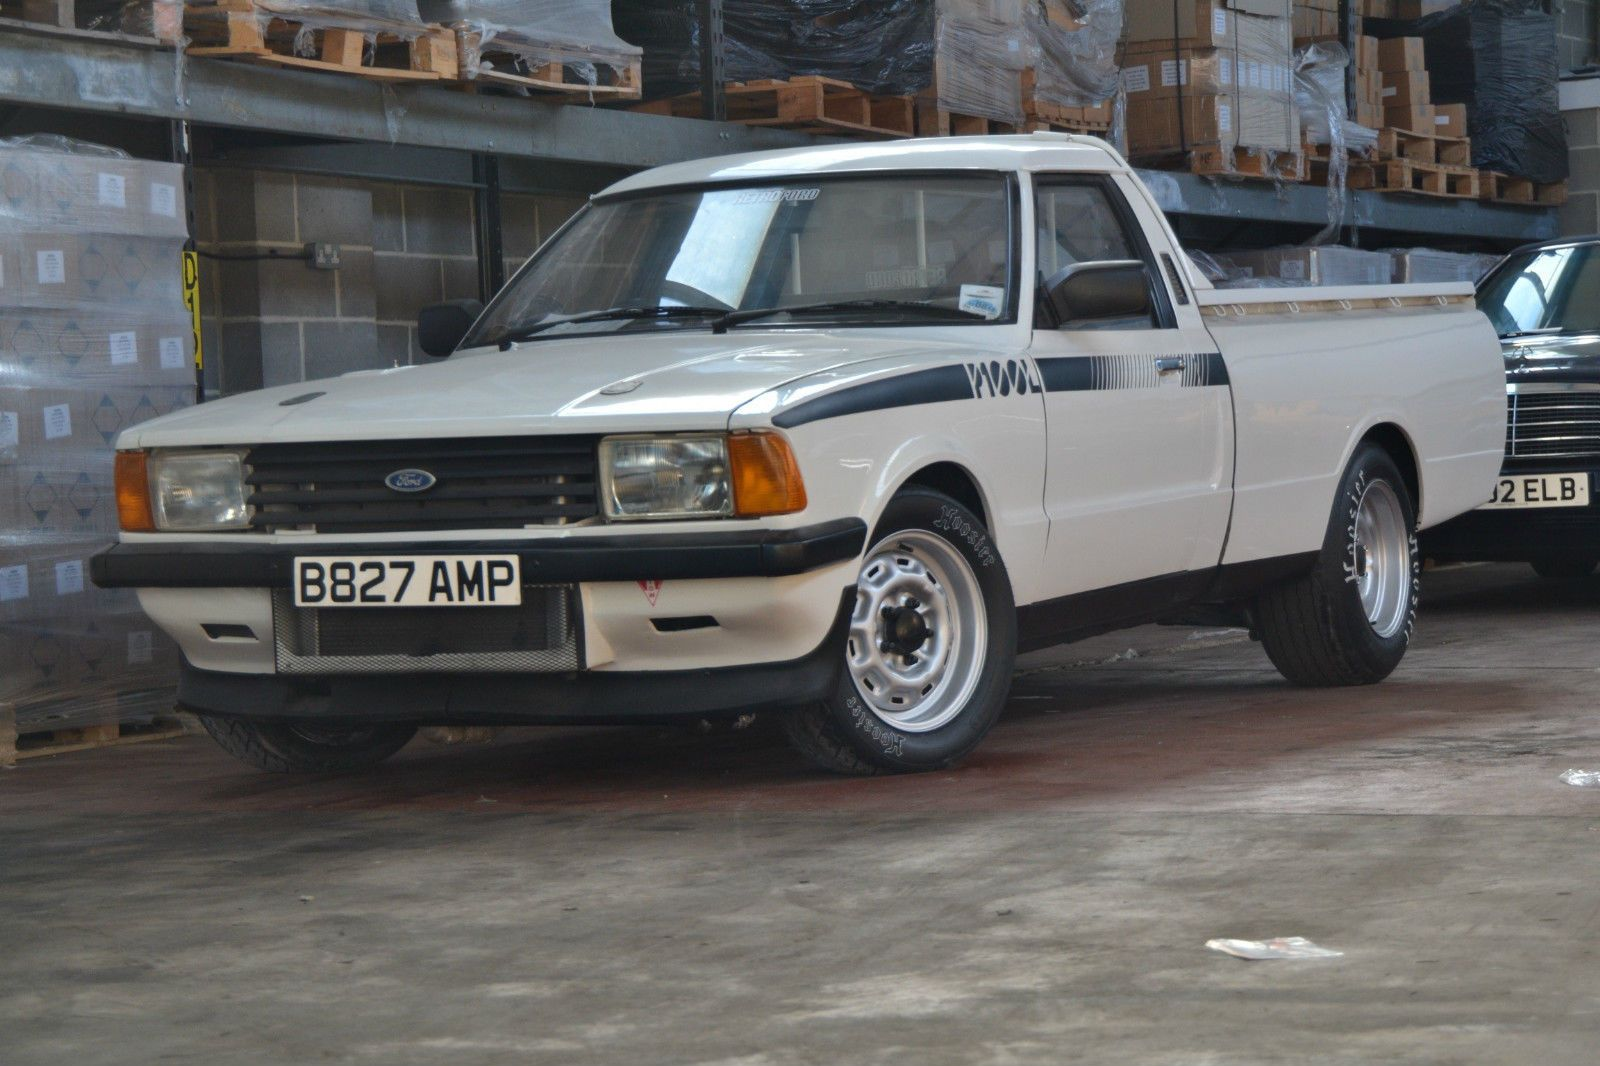 Ford cortina P100 V8 | eBay